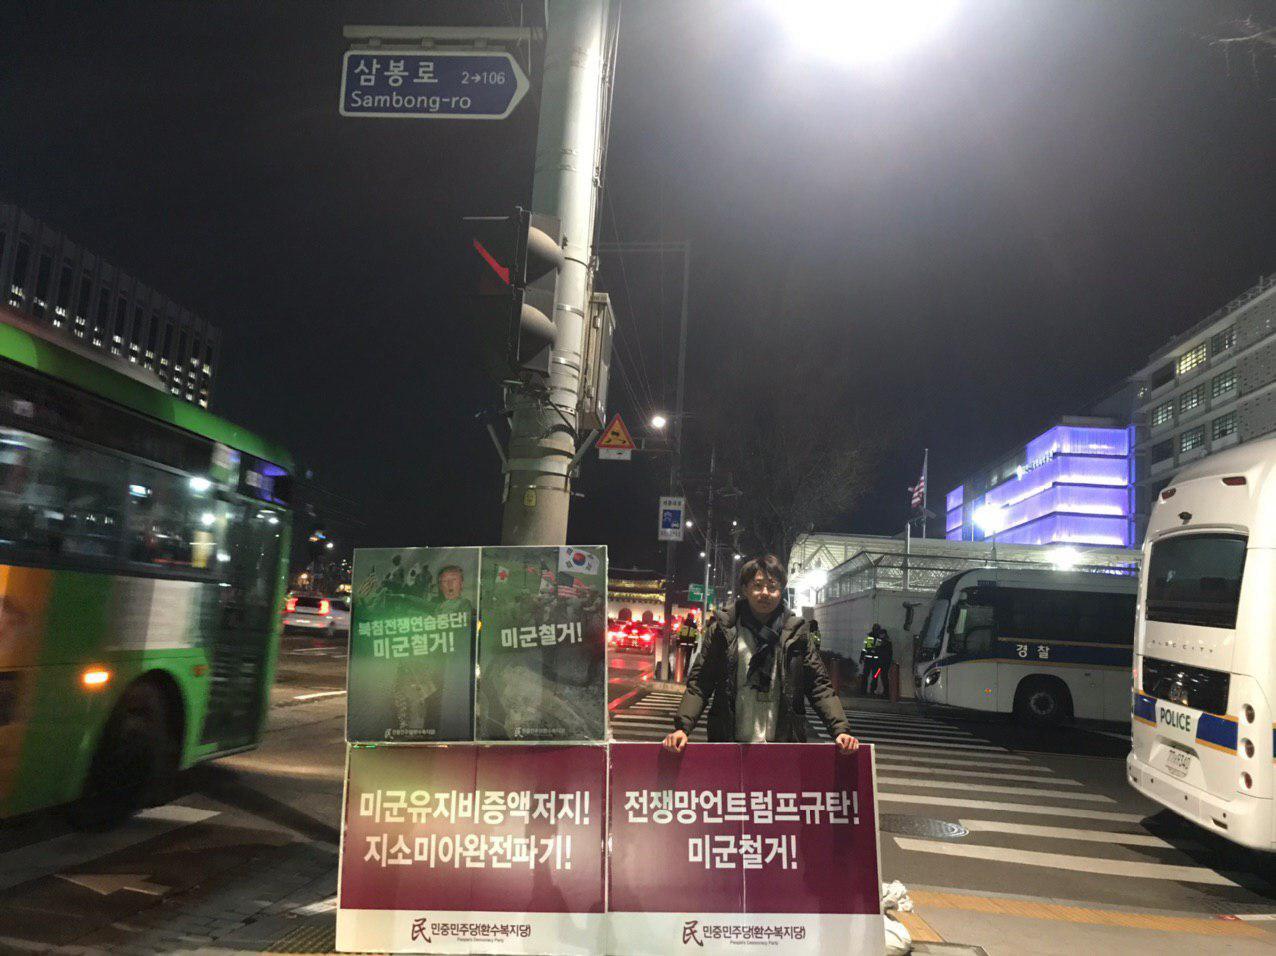 photo_2019-12-18_10-40-12.jpg